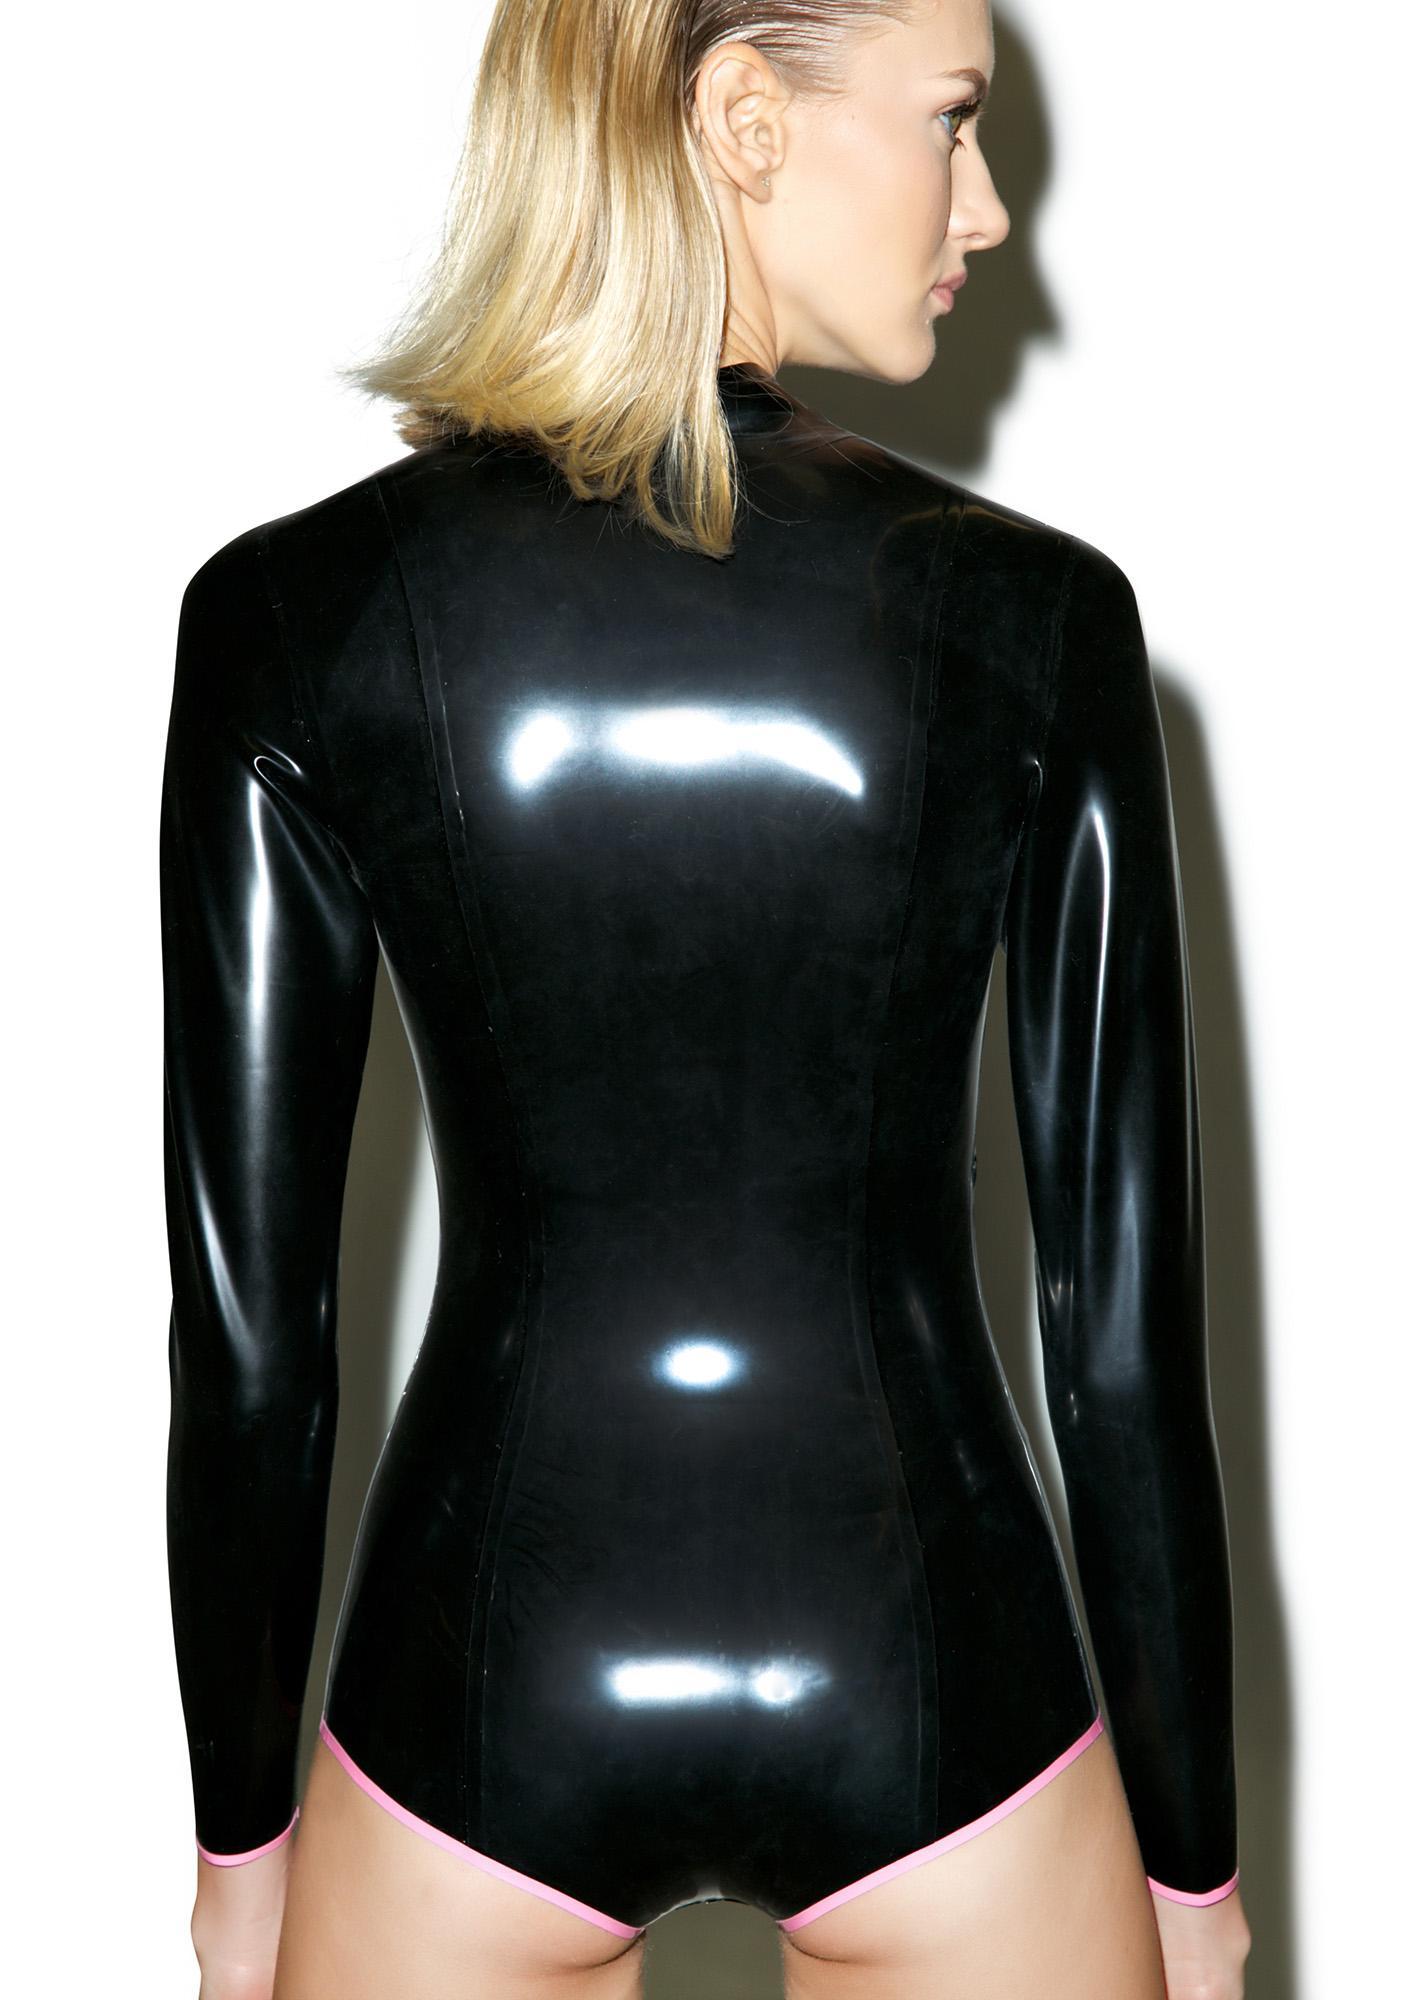 House of Etiquette Fifi Bodysuit